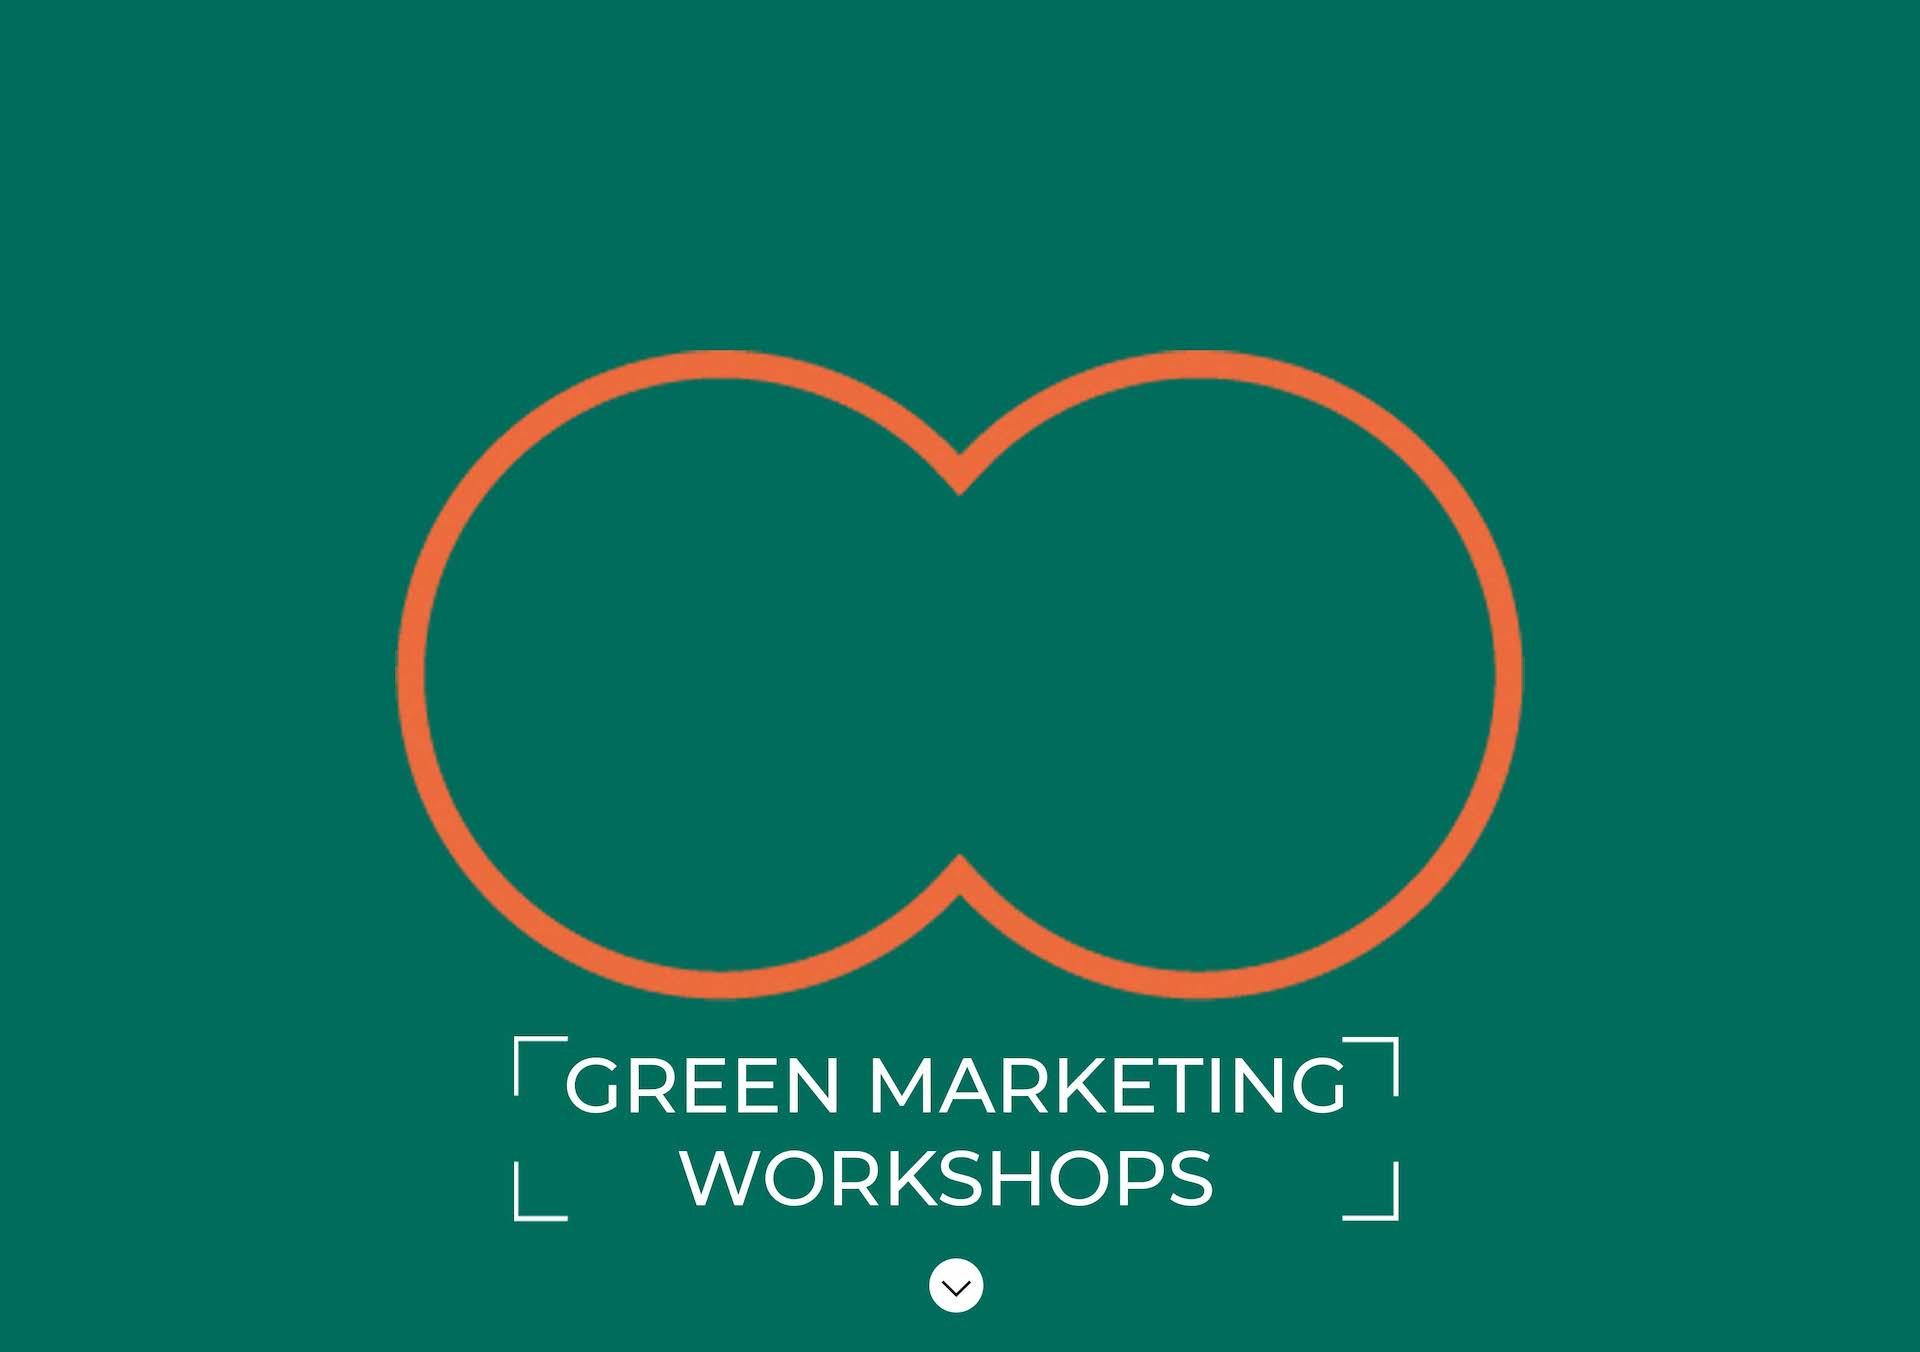 greenmoon-green-marketing-workshops